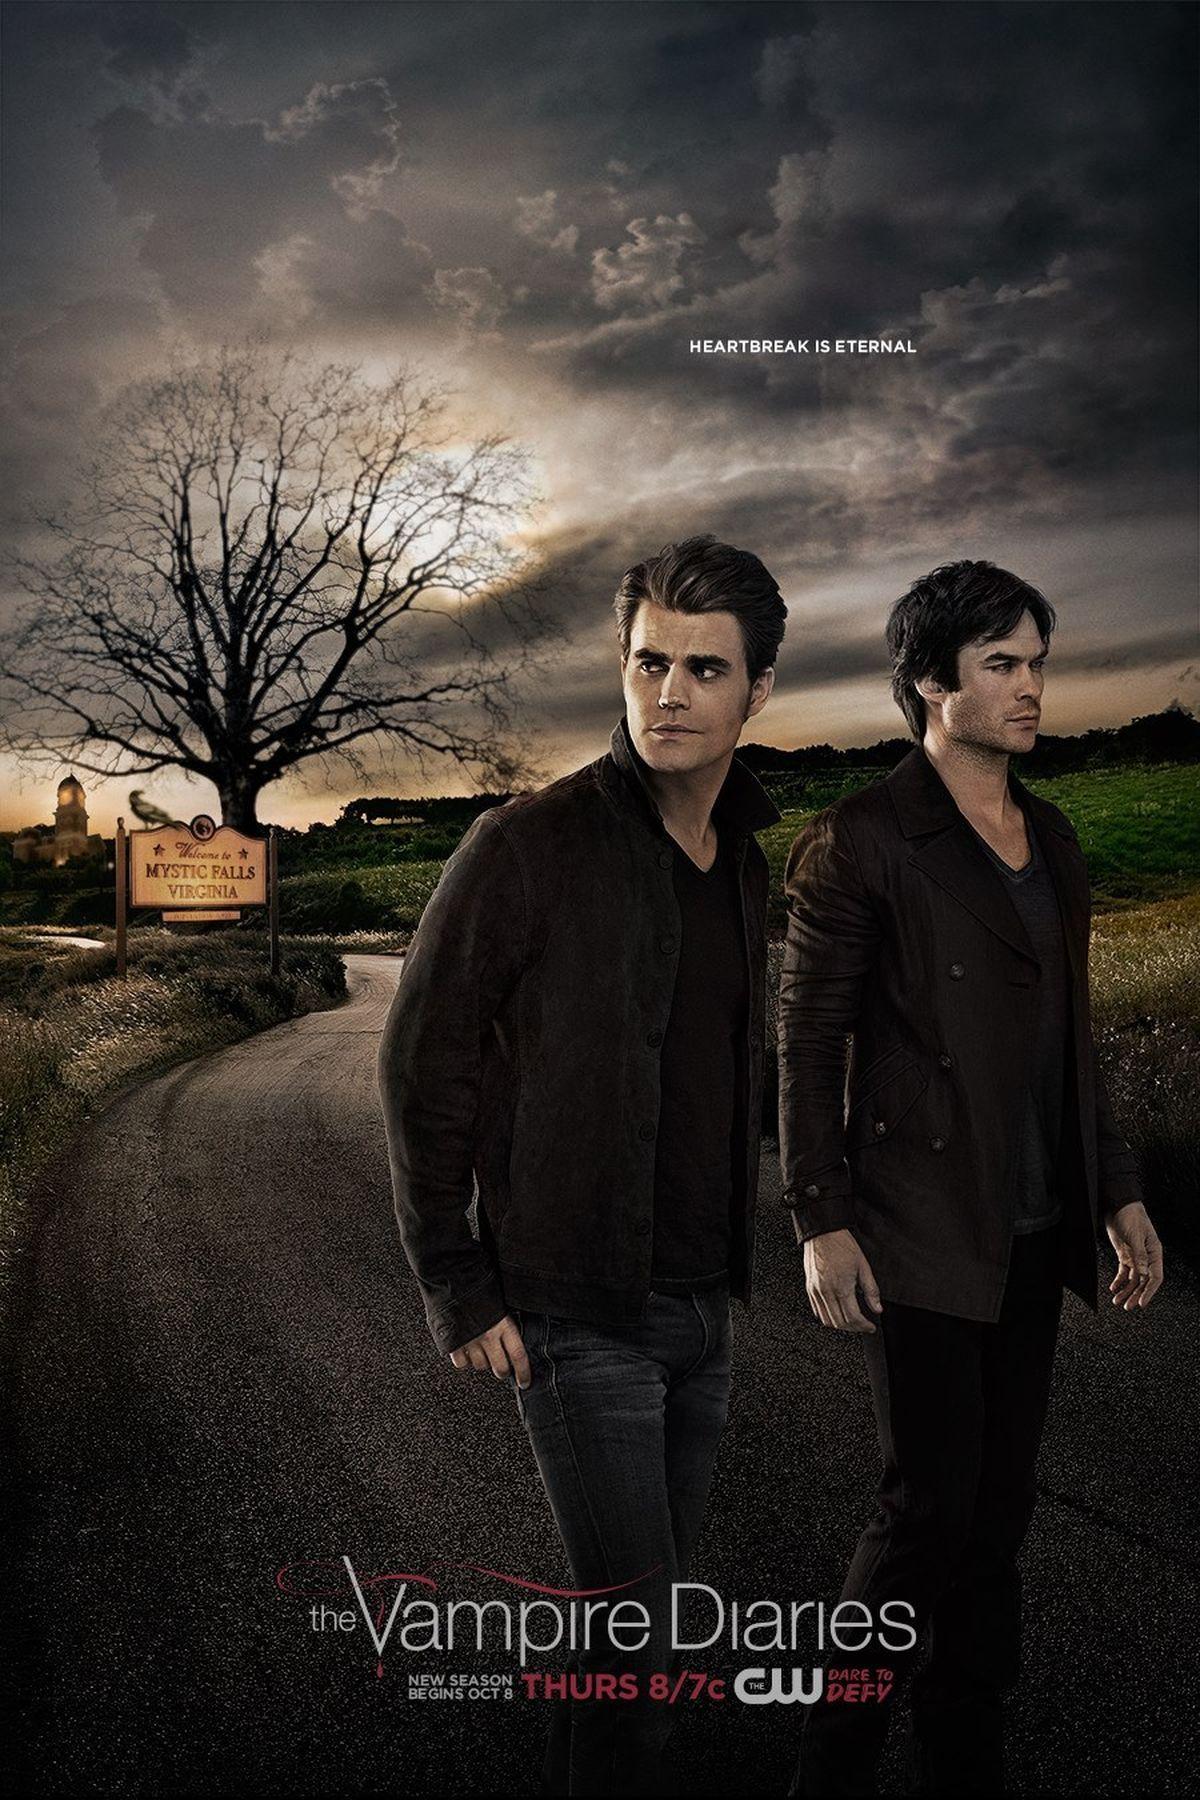 The Vampire Diaries Delena Heartbreak Lives On In New Season 7